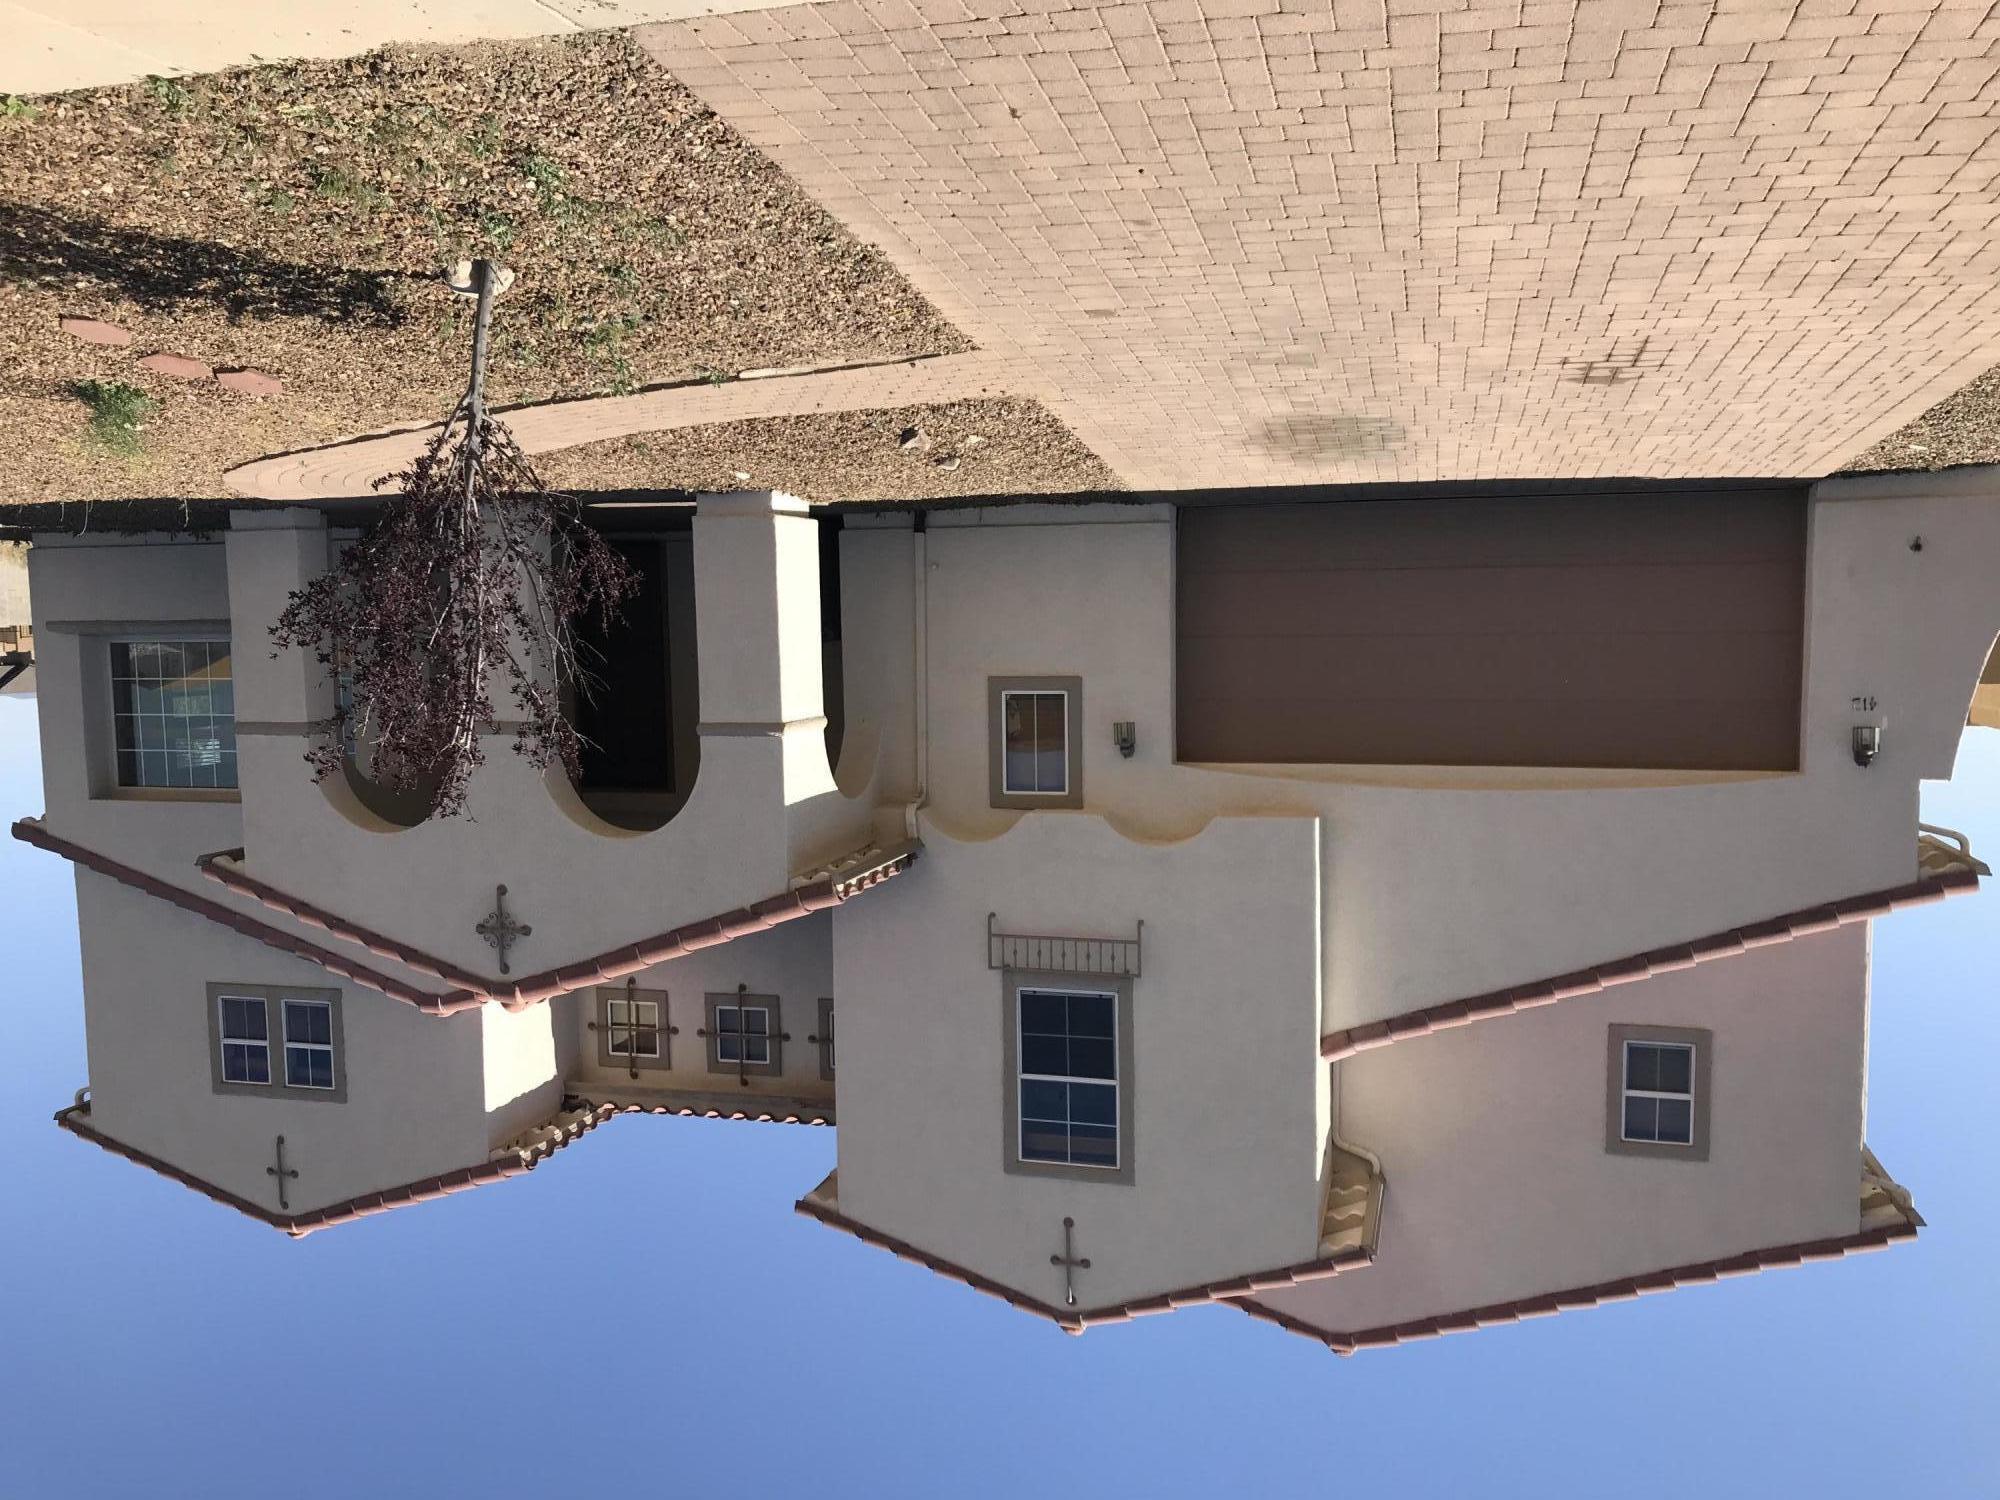 412 McKinnon Rd Clarkdale, AZ 86324